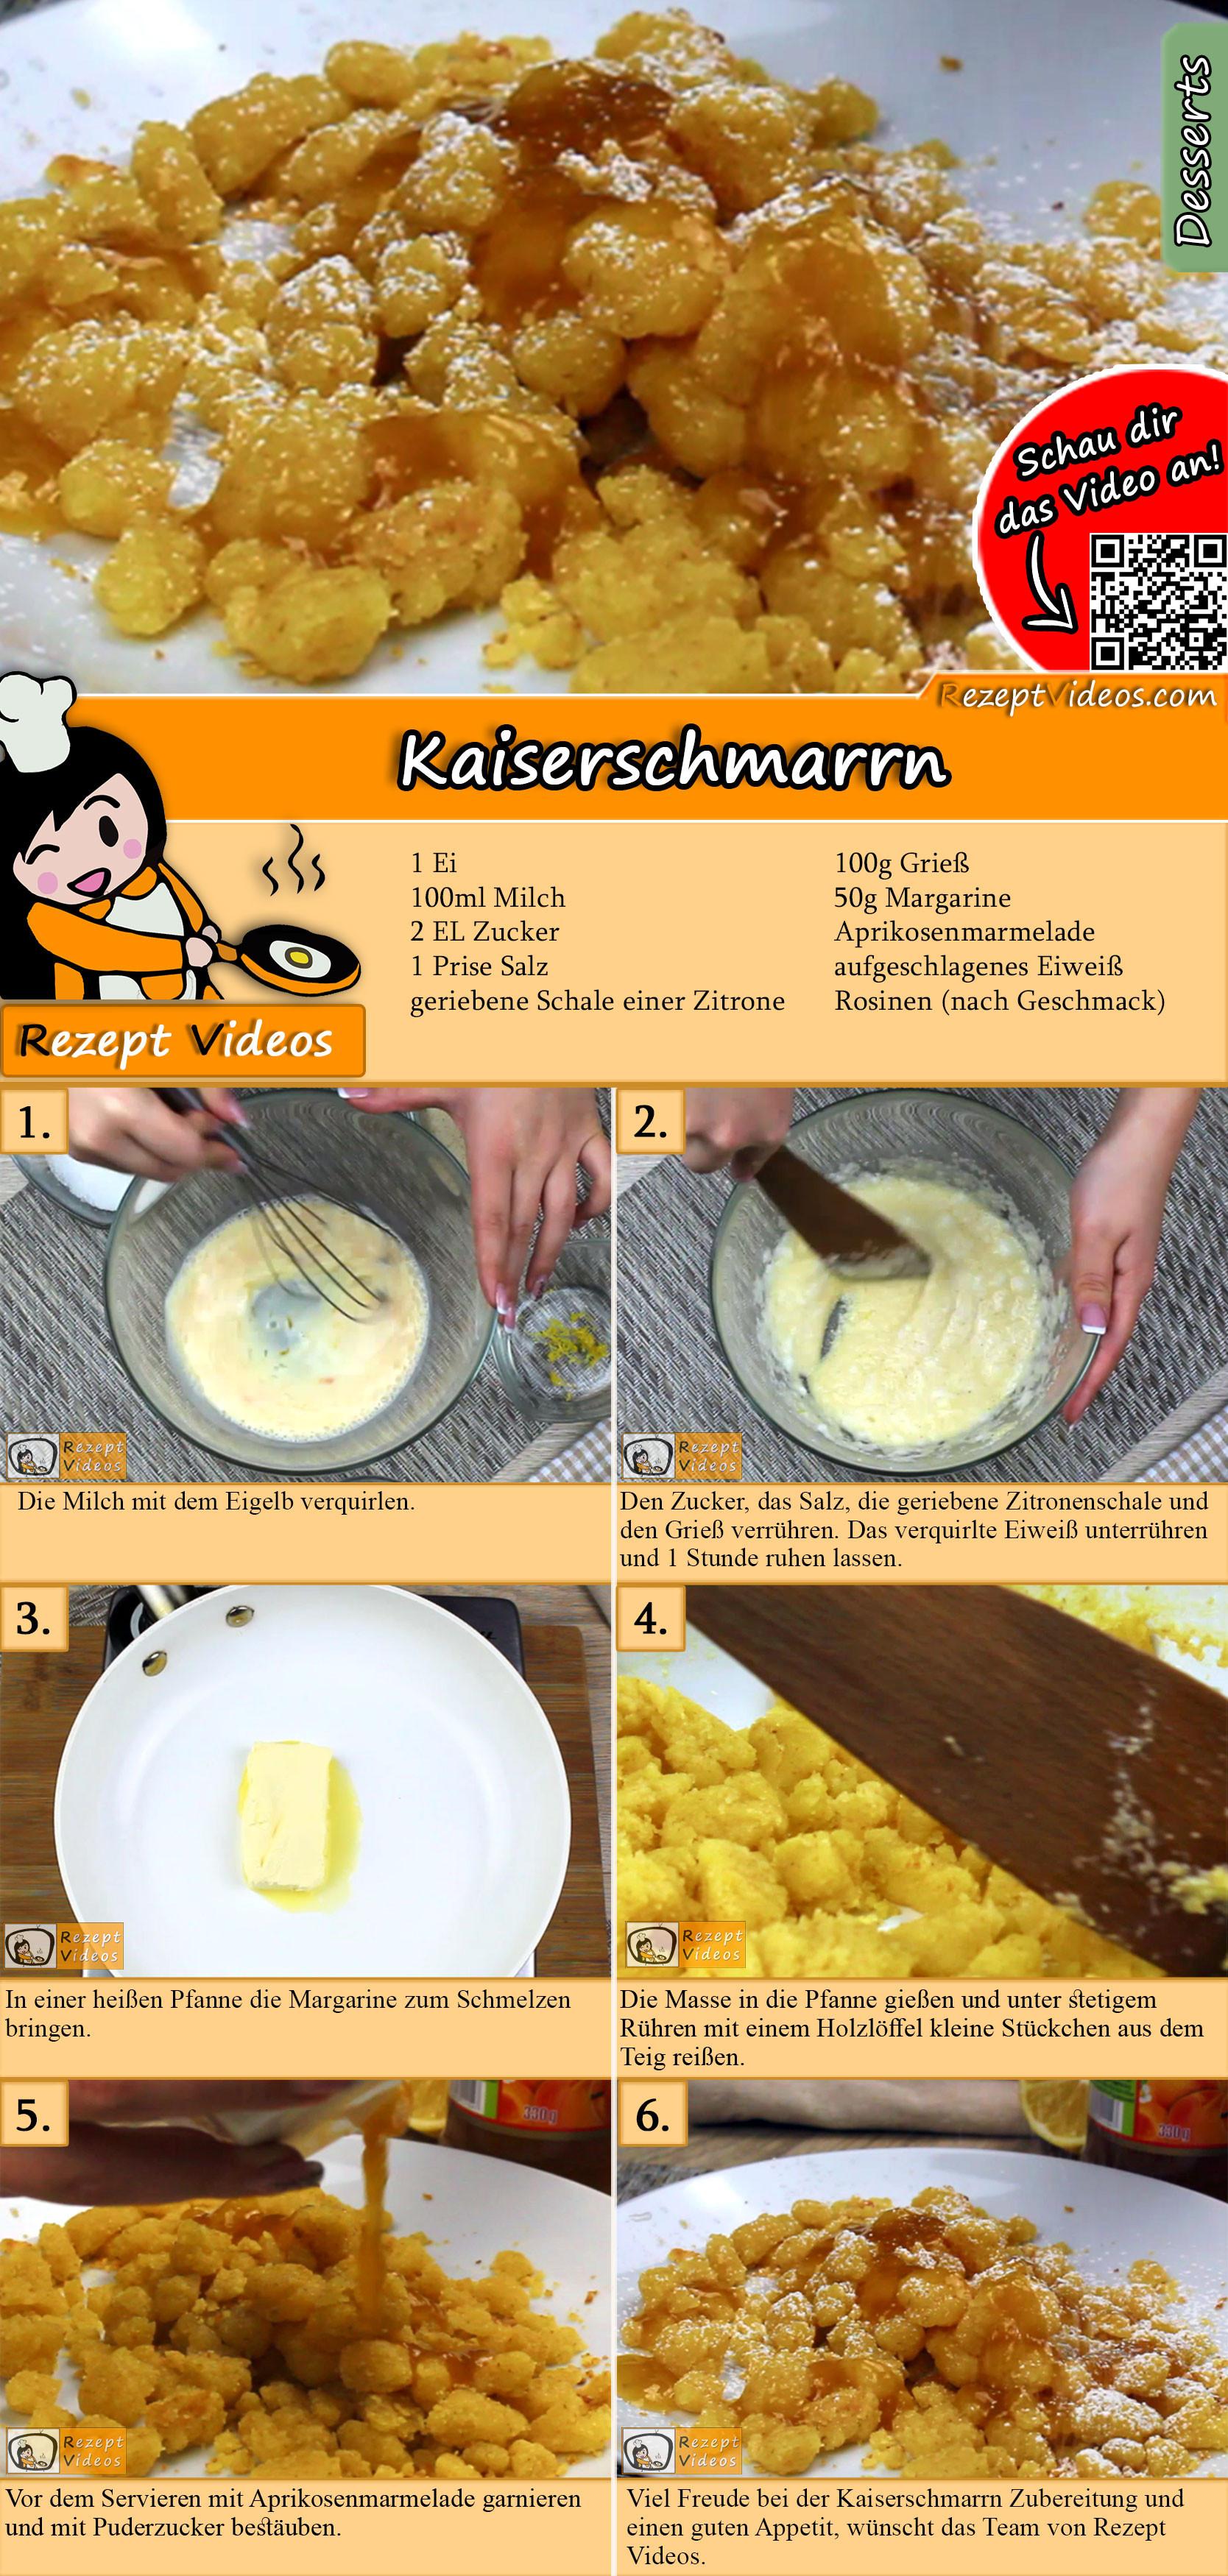 Kaiserschmarrn Rezept mit Video